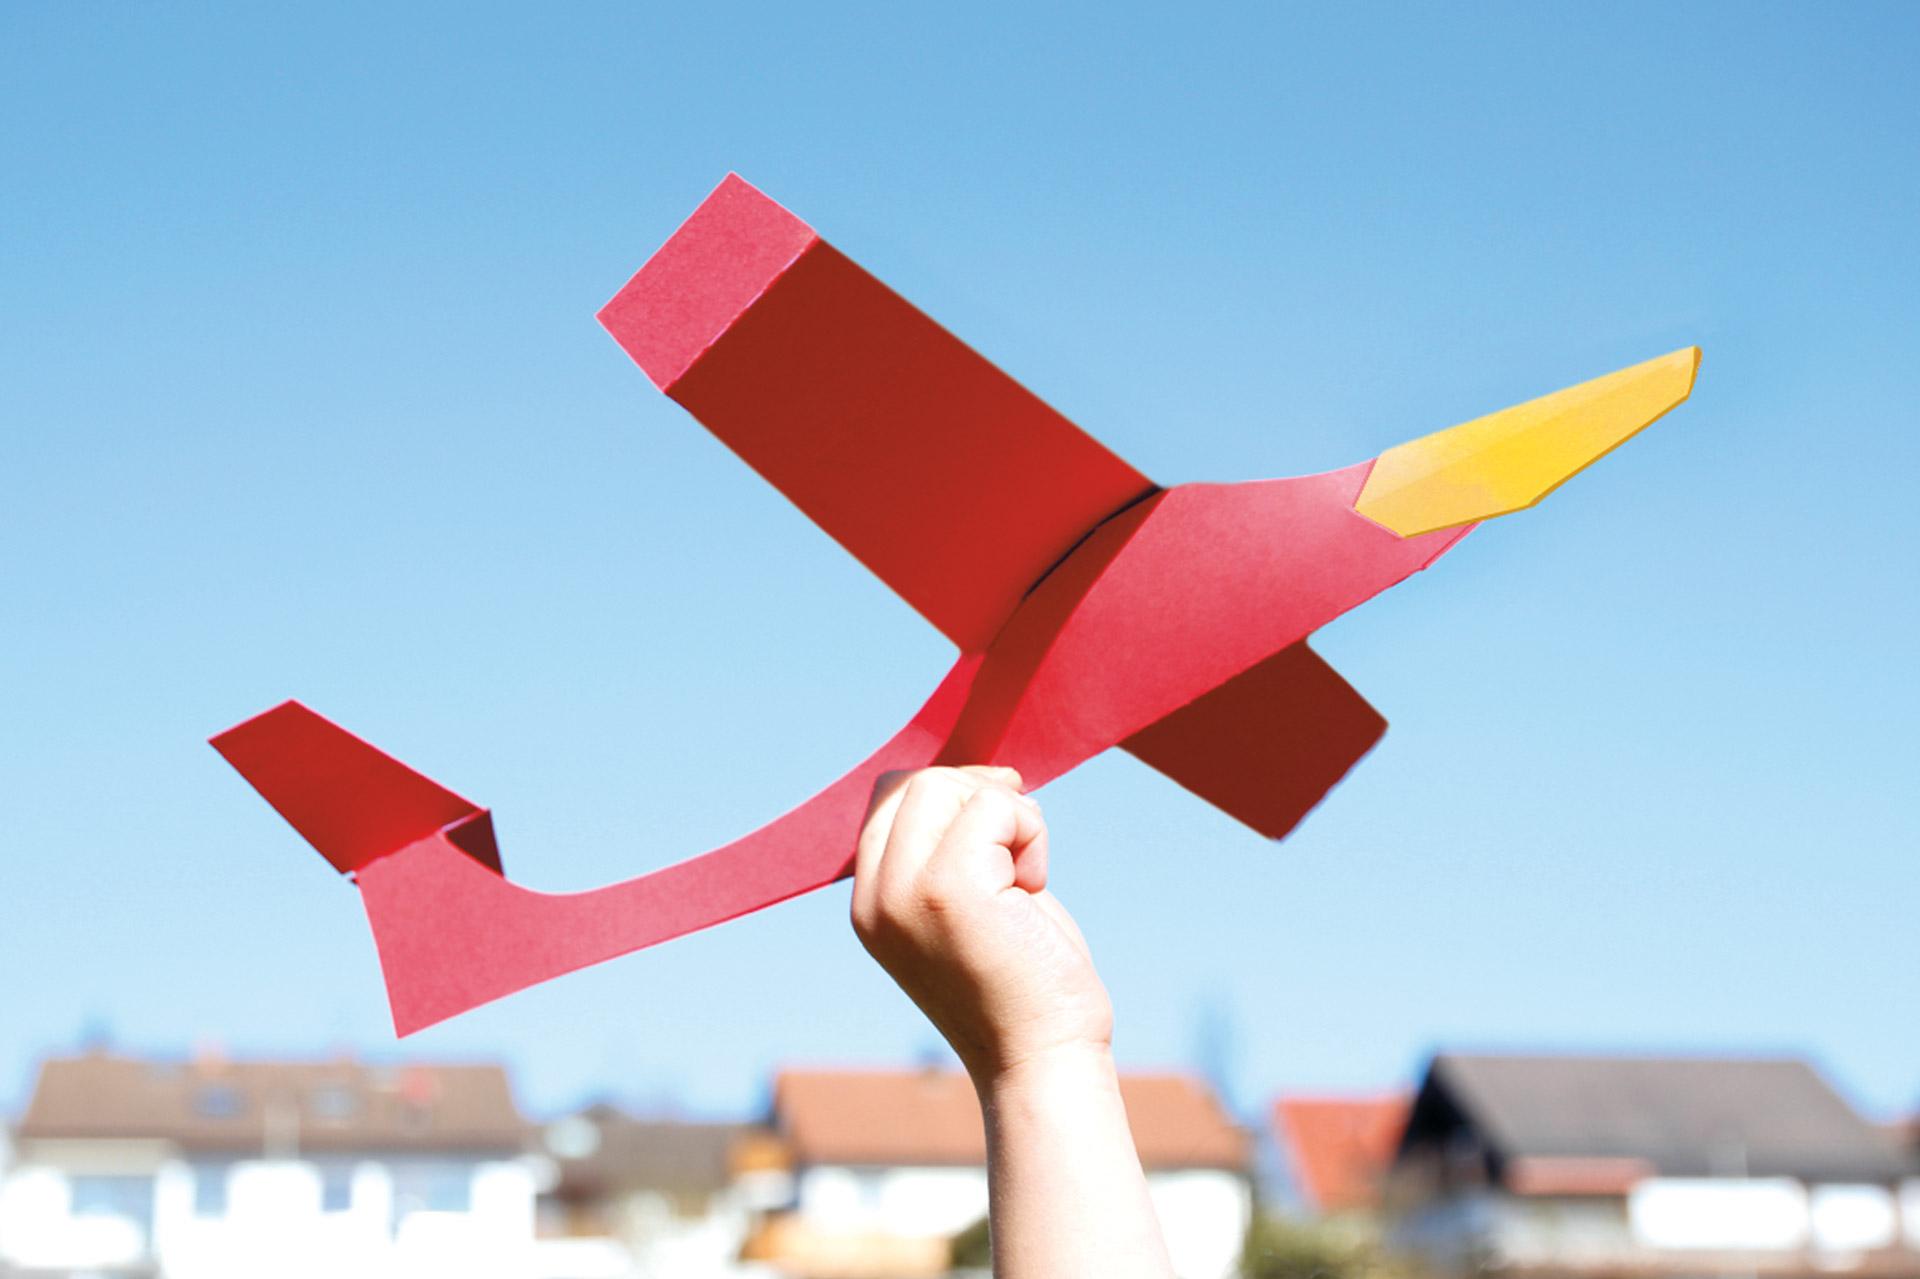 Segelflugsatz-Bausatz-inAktion-ksg